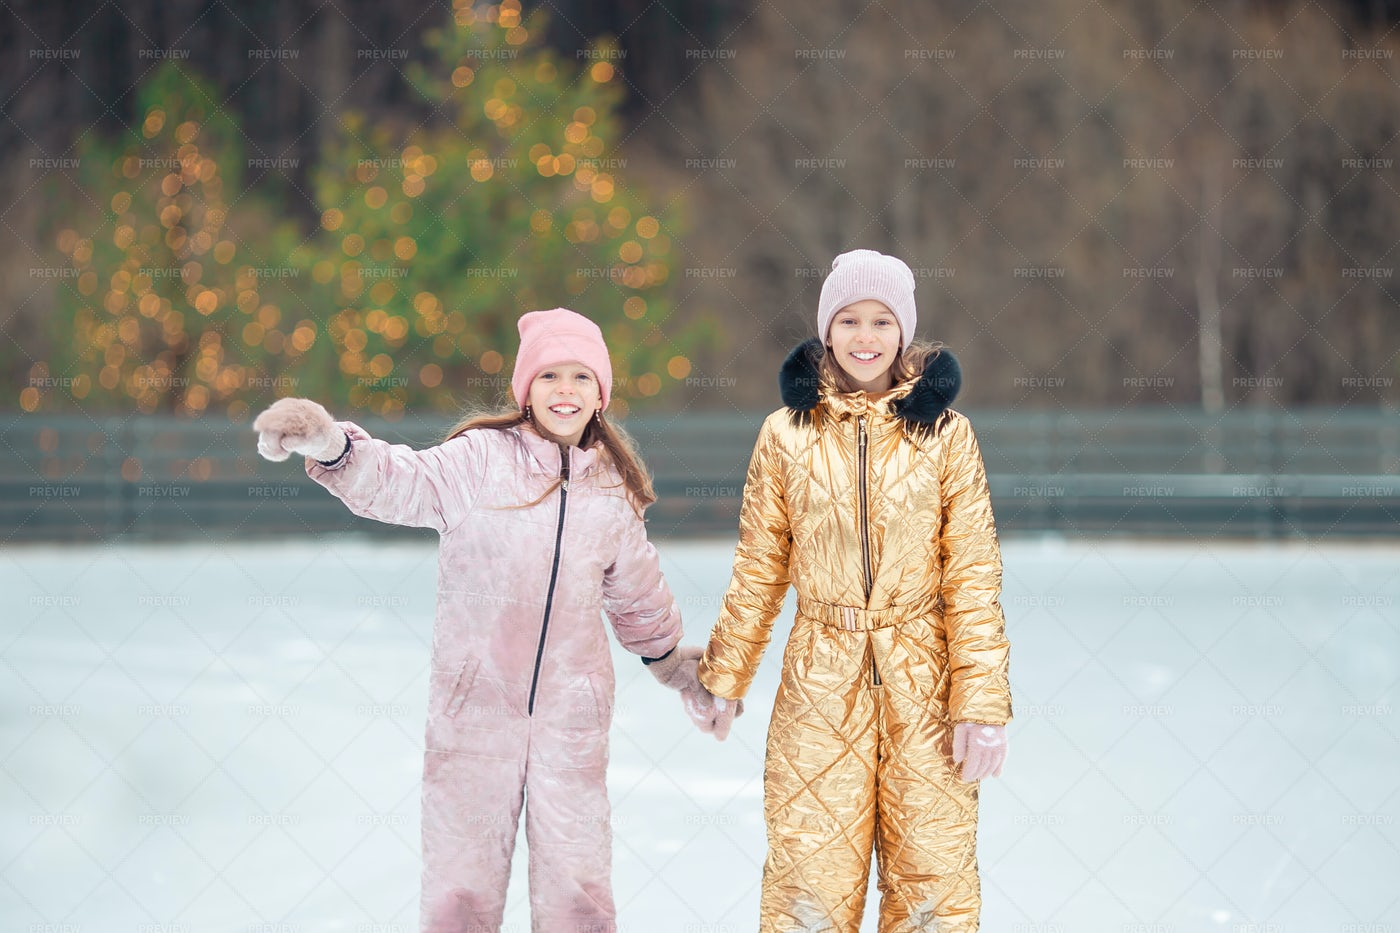 Girls Skating On Ice Rink: Stock Photos